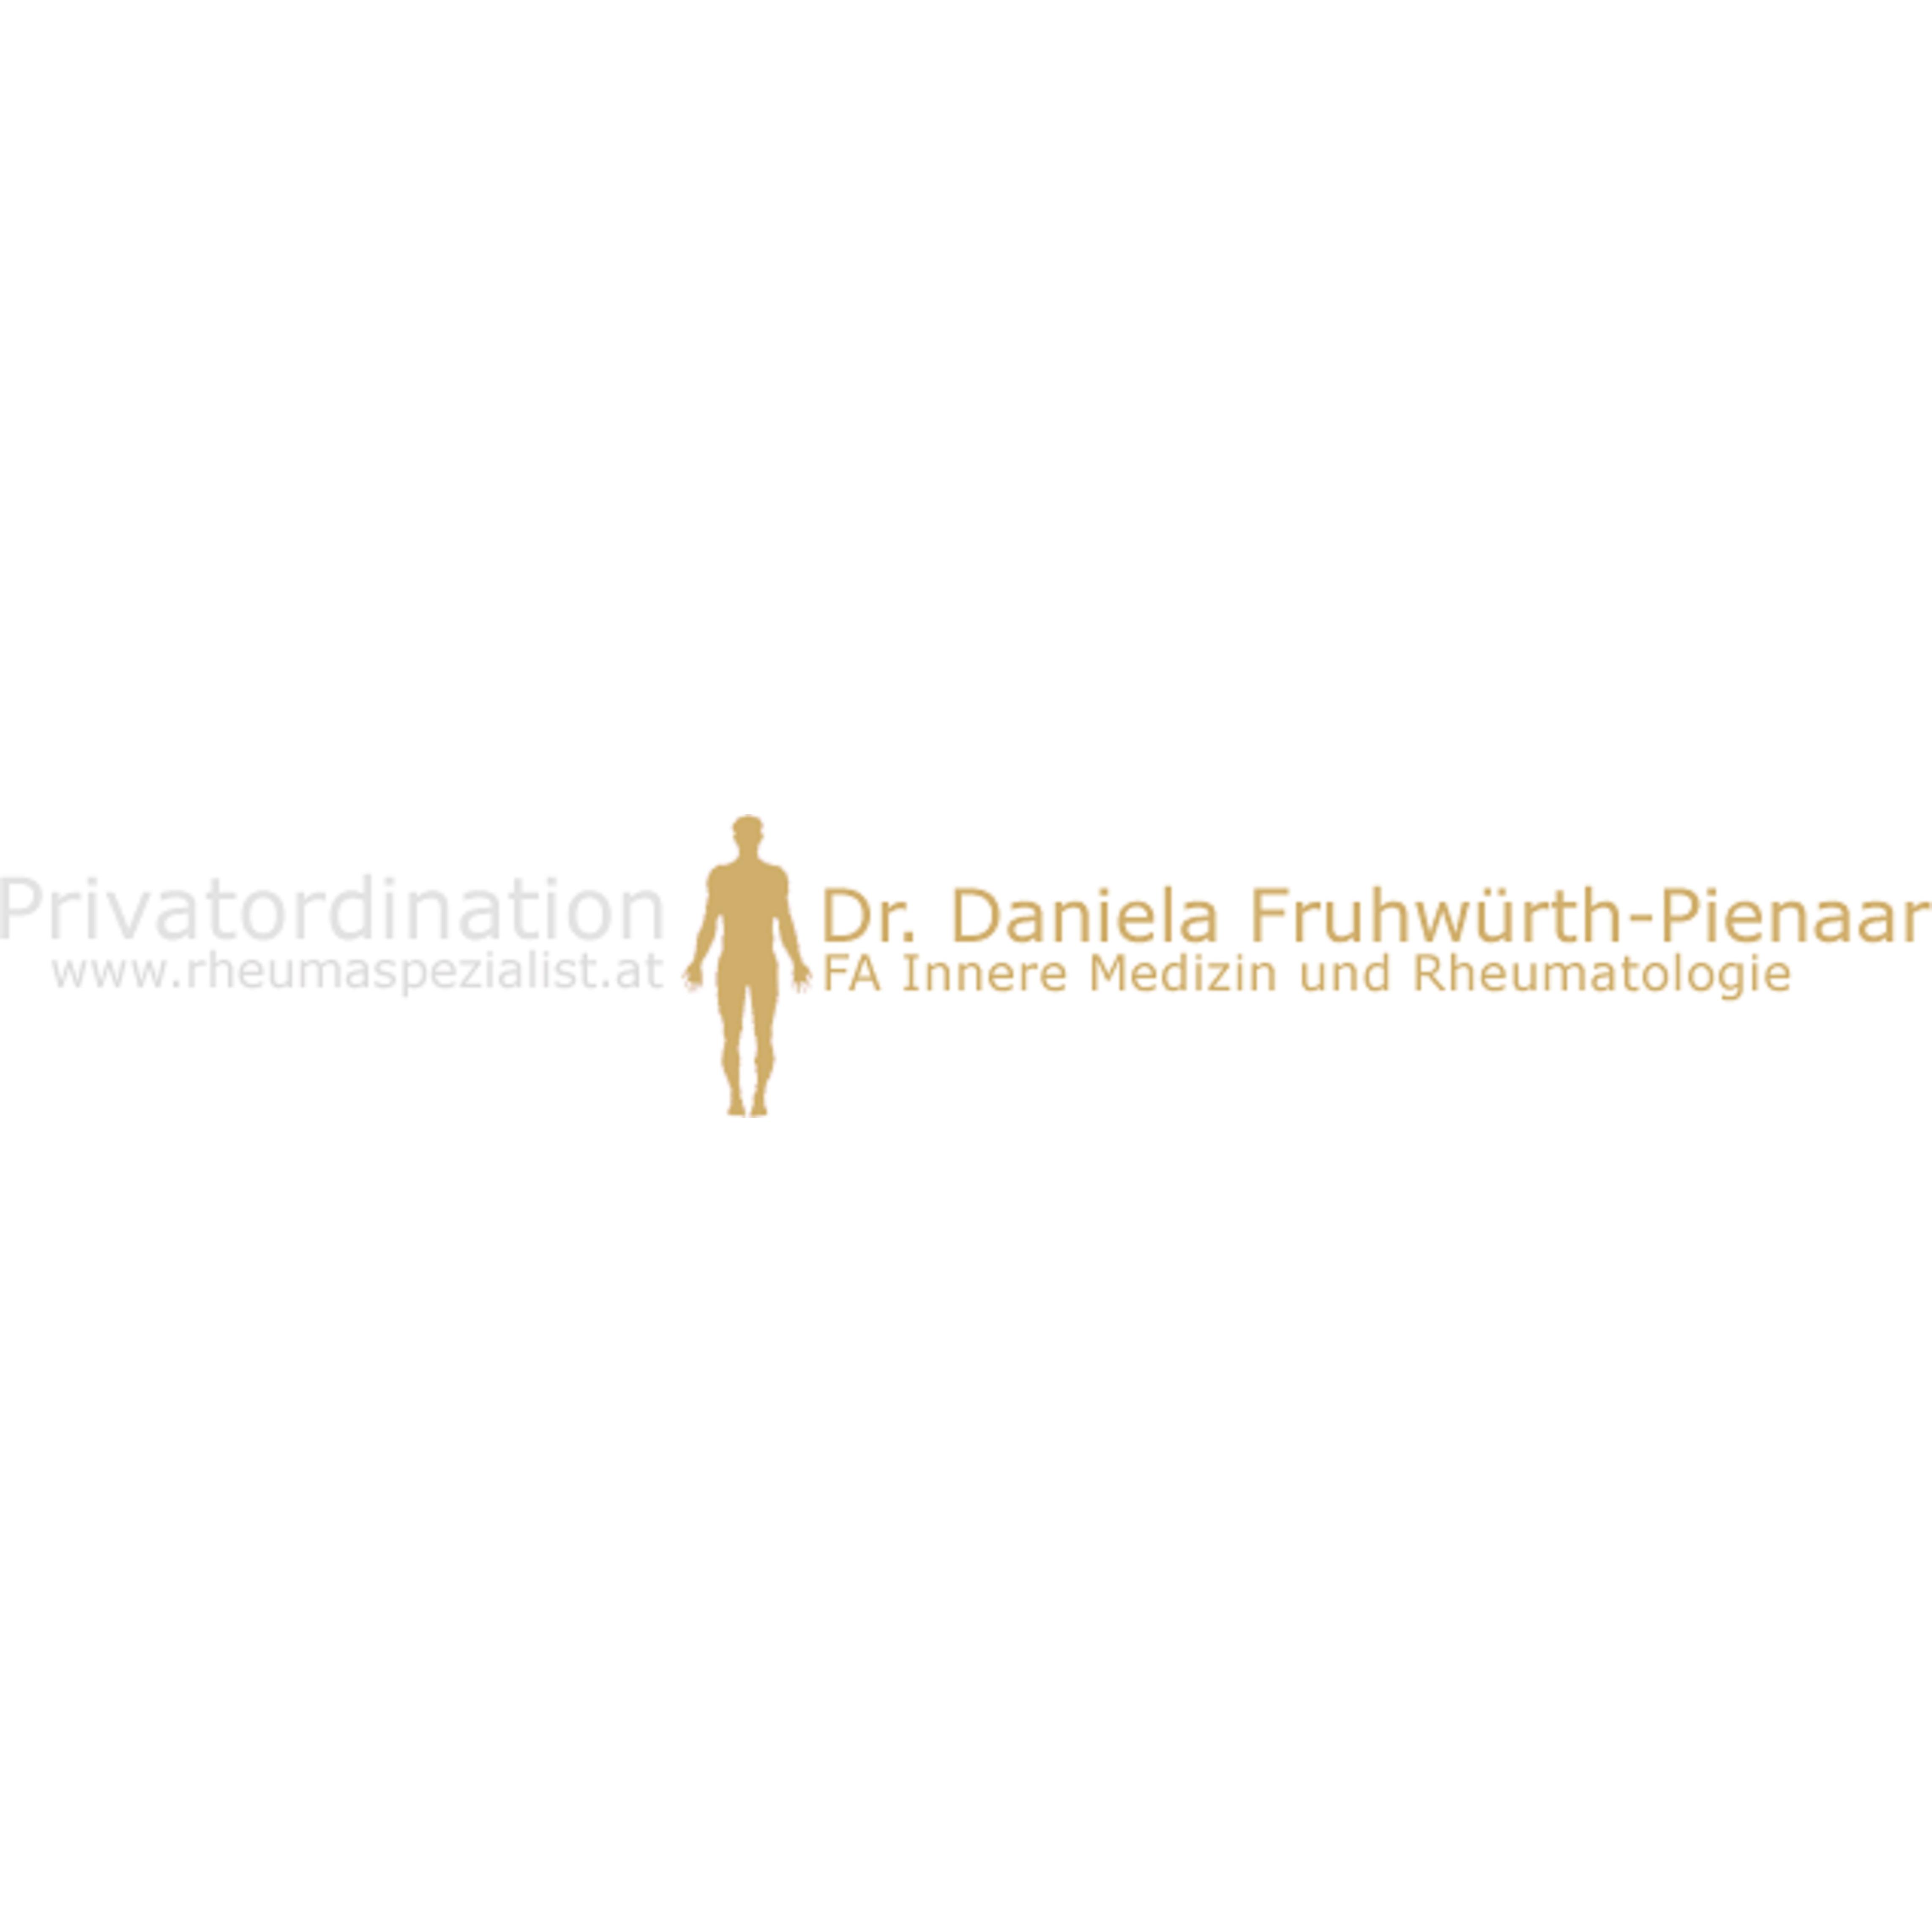 Rheumaspezialist Dr. Daniela Fruhwürth-Pienaar